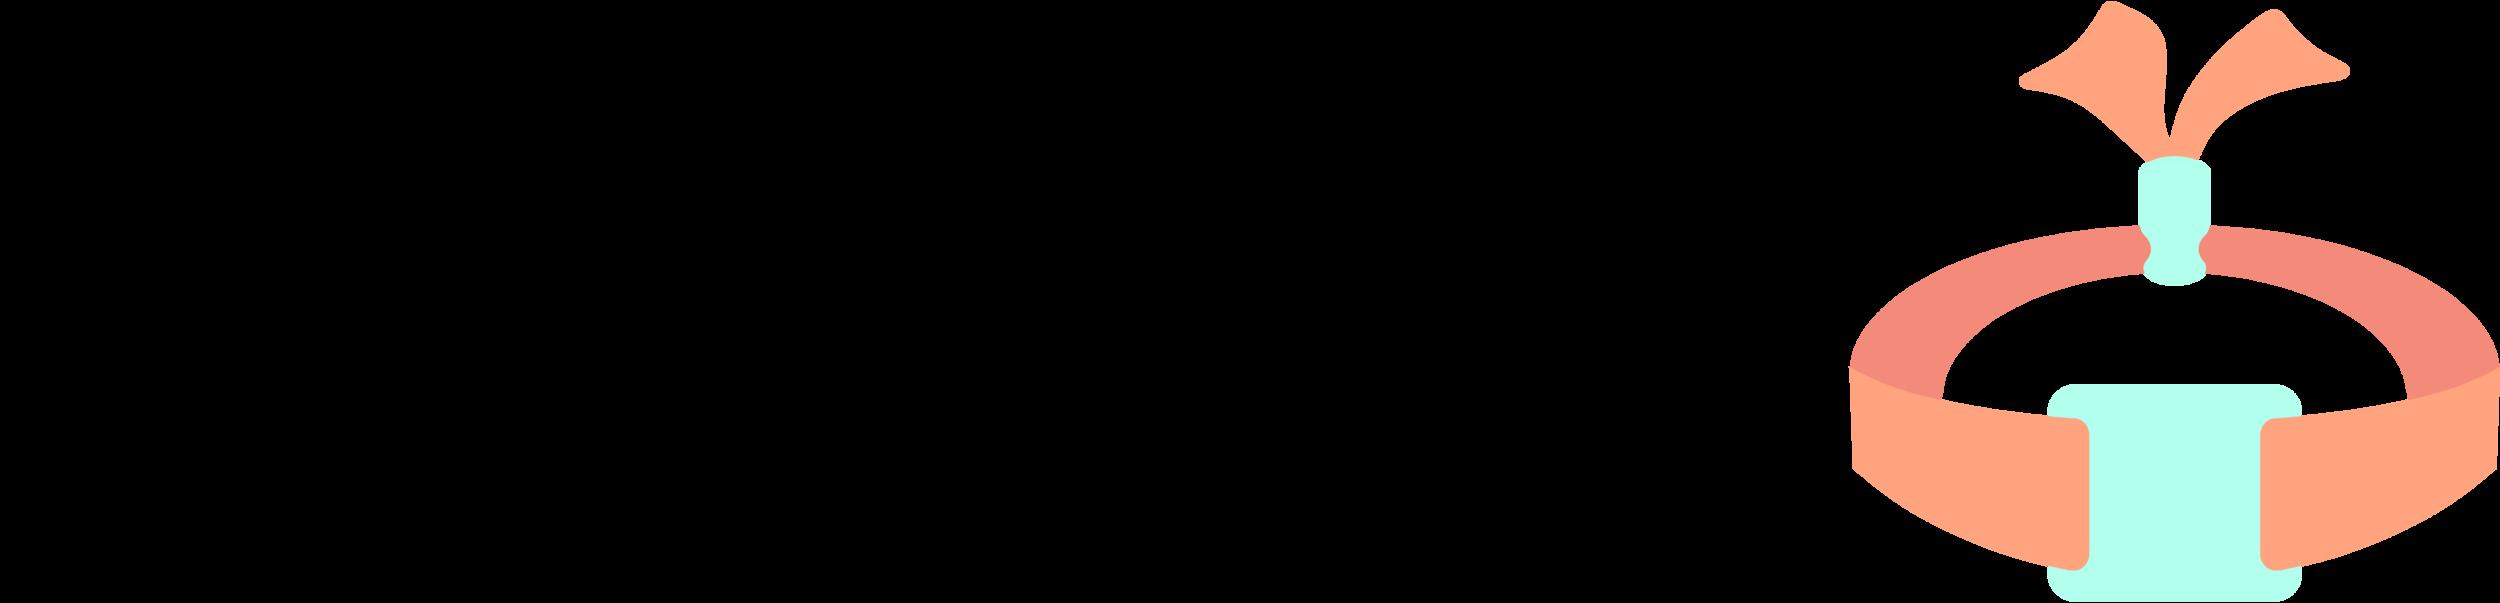 colored logo black.png